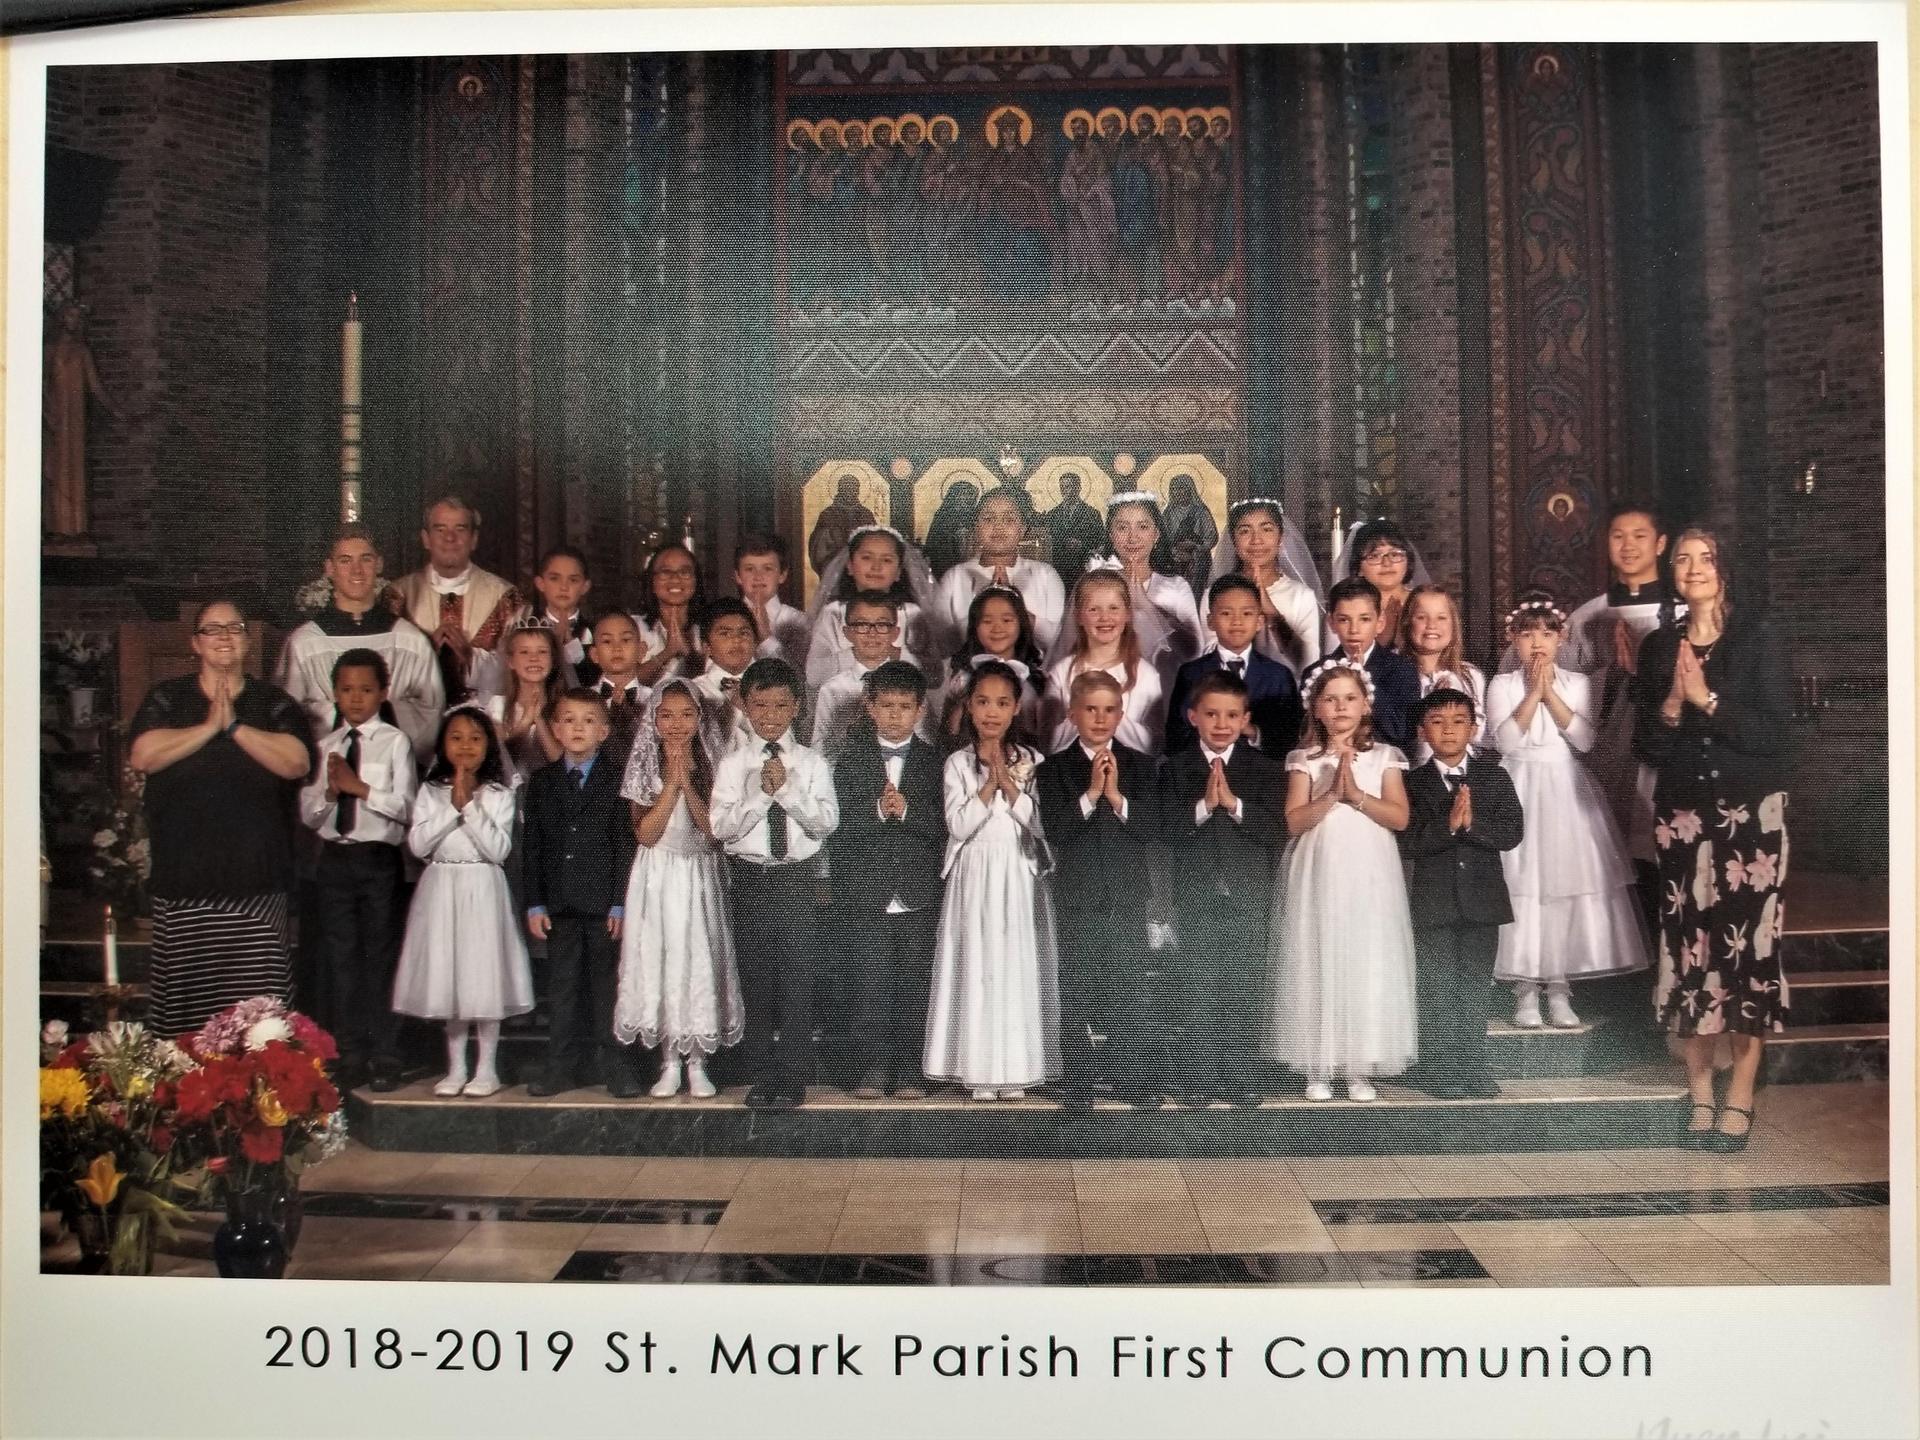 Our second sacrament